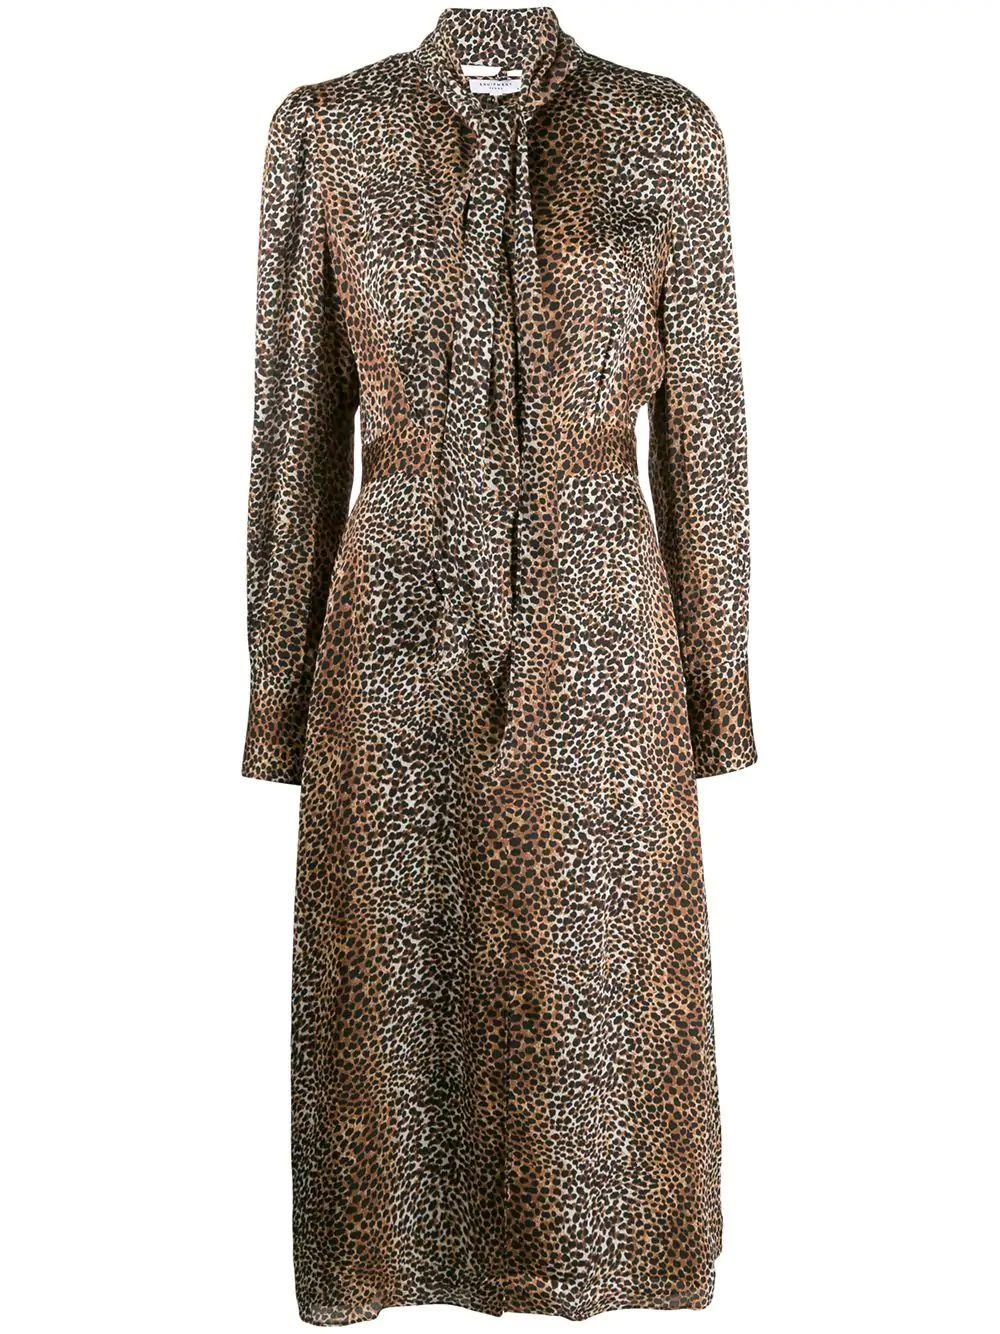 Calanne Animal Print Keyhole Long Dress Item # 5649-DR02068S